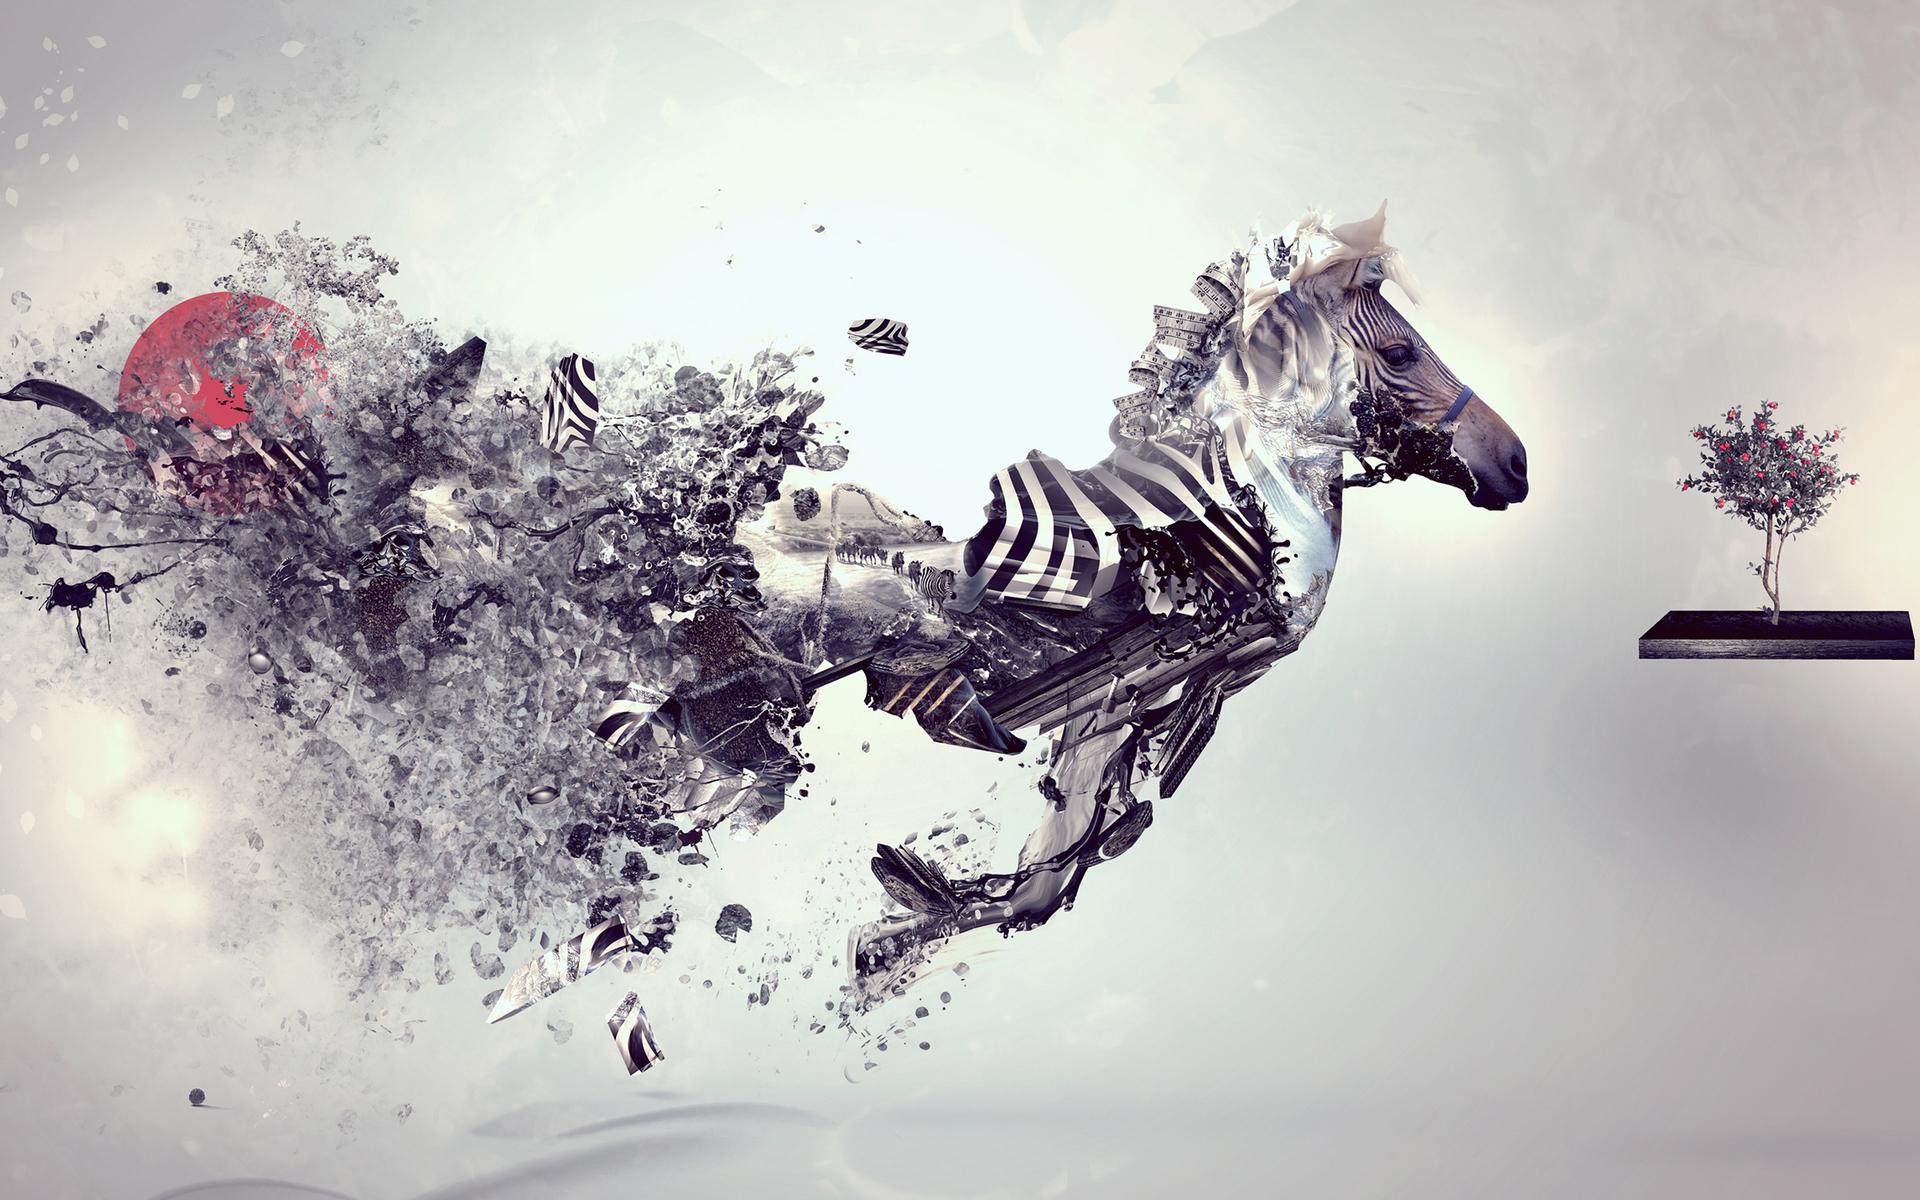 Creative_Wallpaper_Creative_zebra_028239_